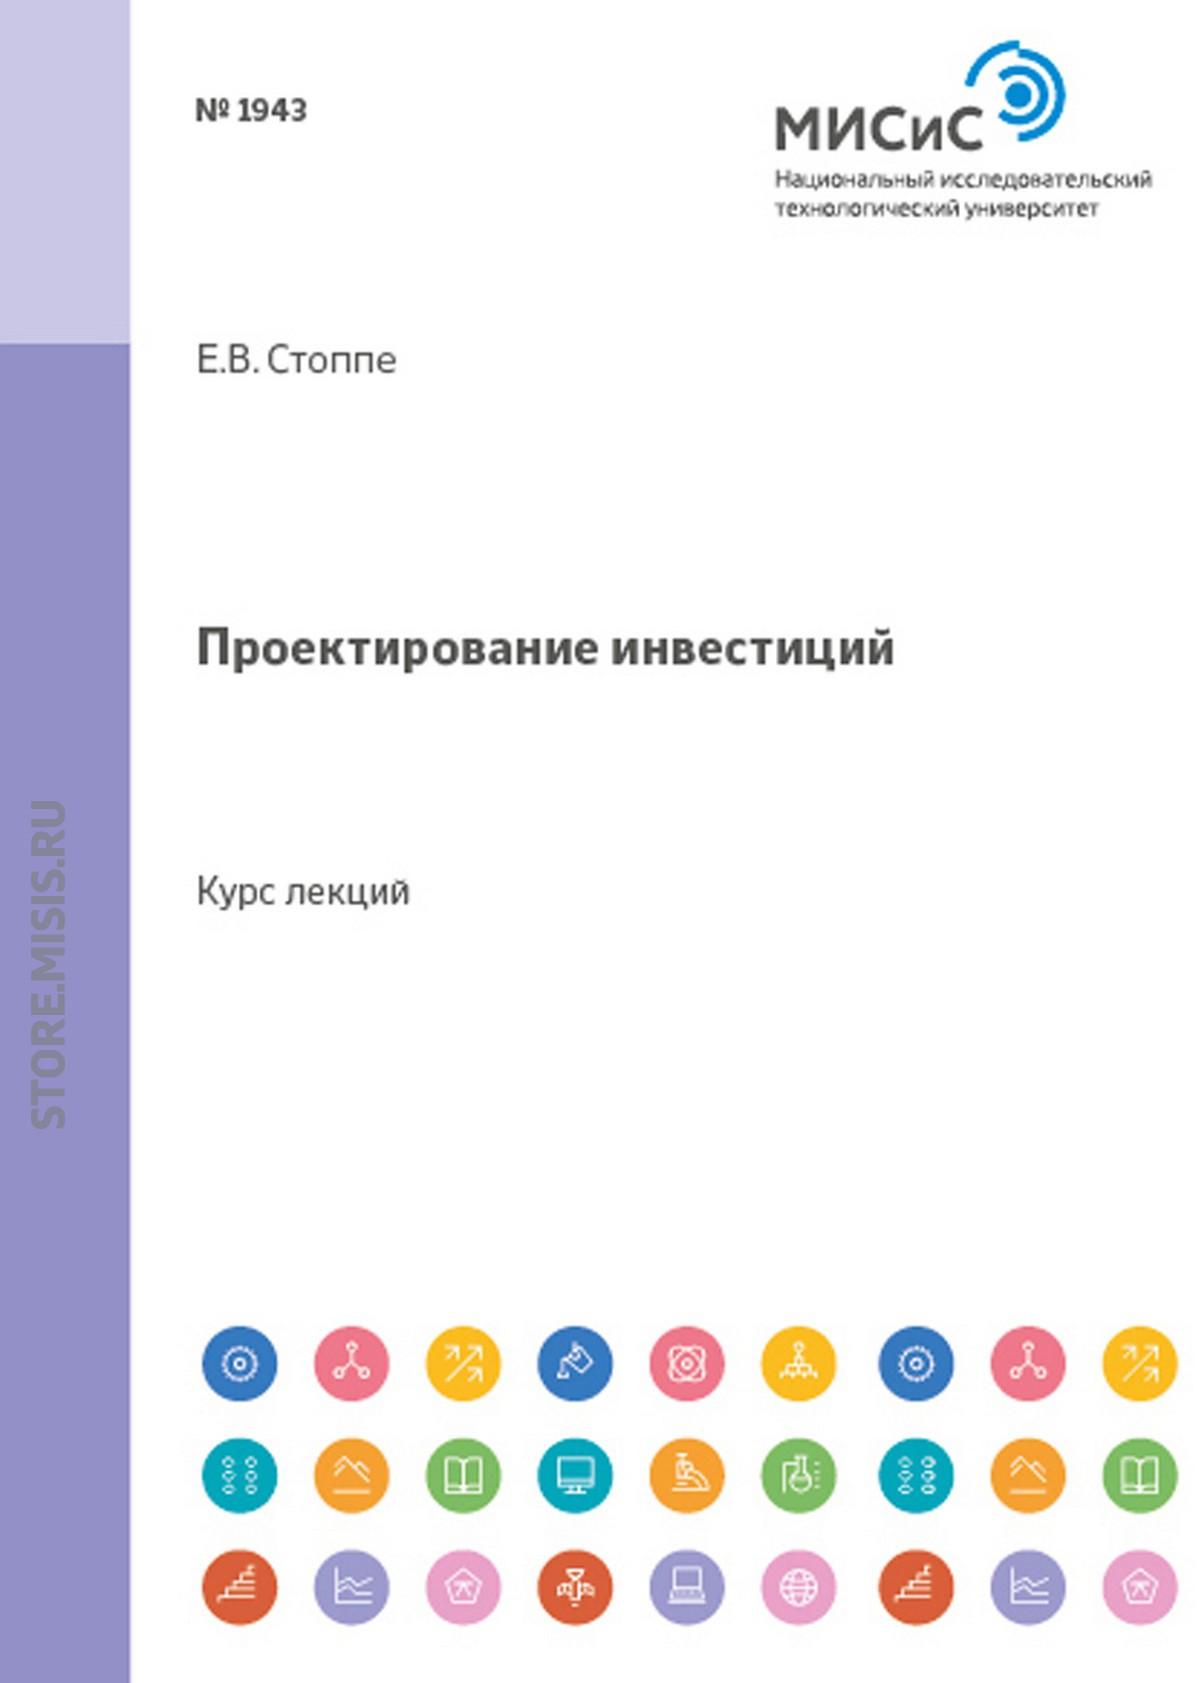 Екатерина Стоппе Проектирование инвестиций тарифный план